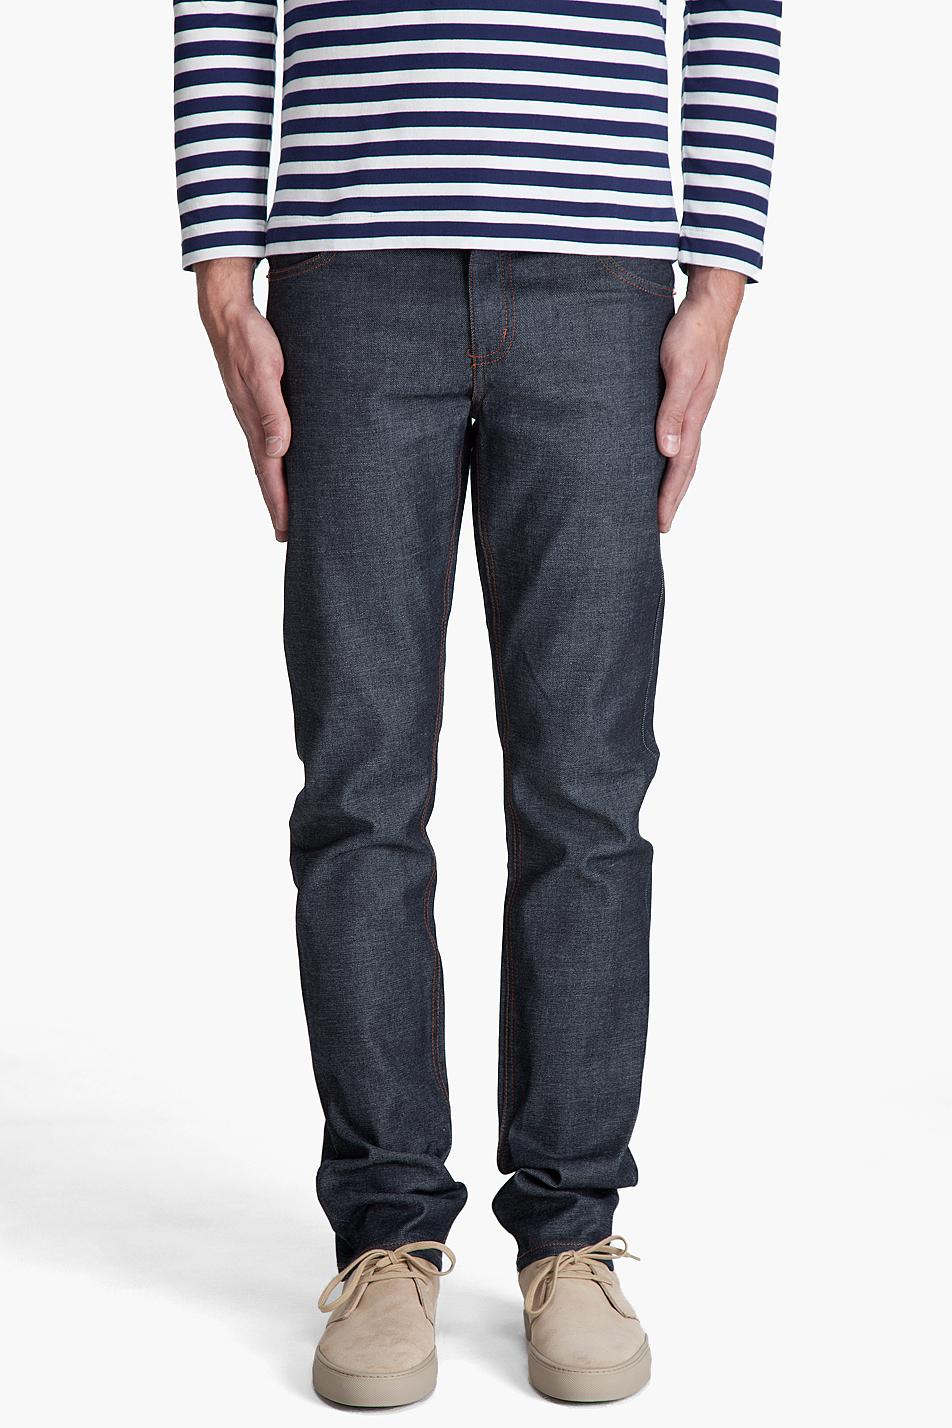 cheap monday premium tight jeans in blue for men indigo. Black Bedroom Furniture Sets. Home Design Ideas